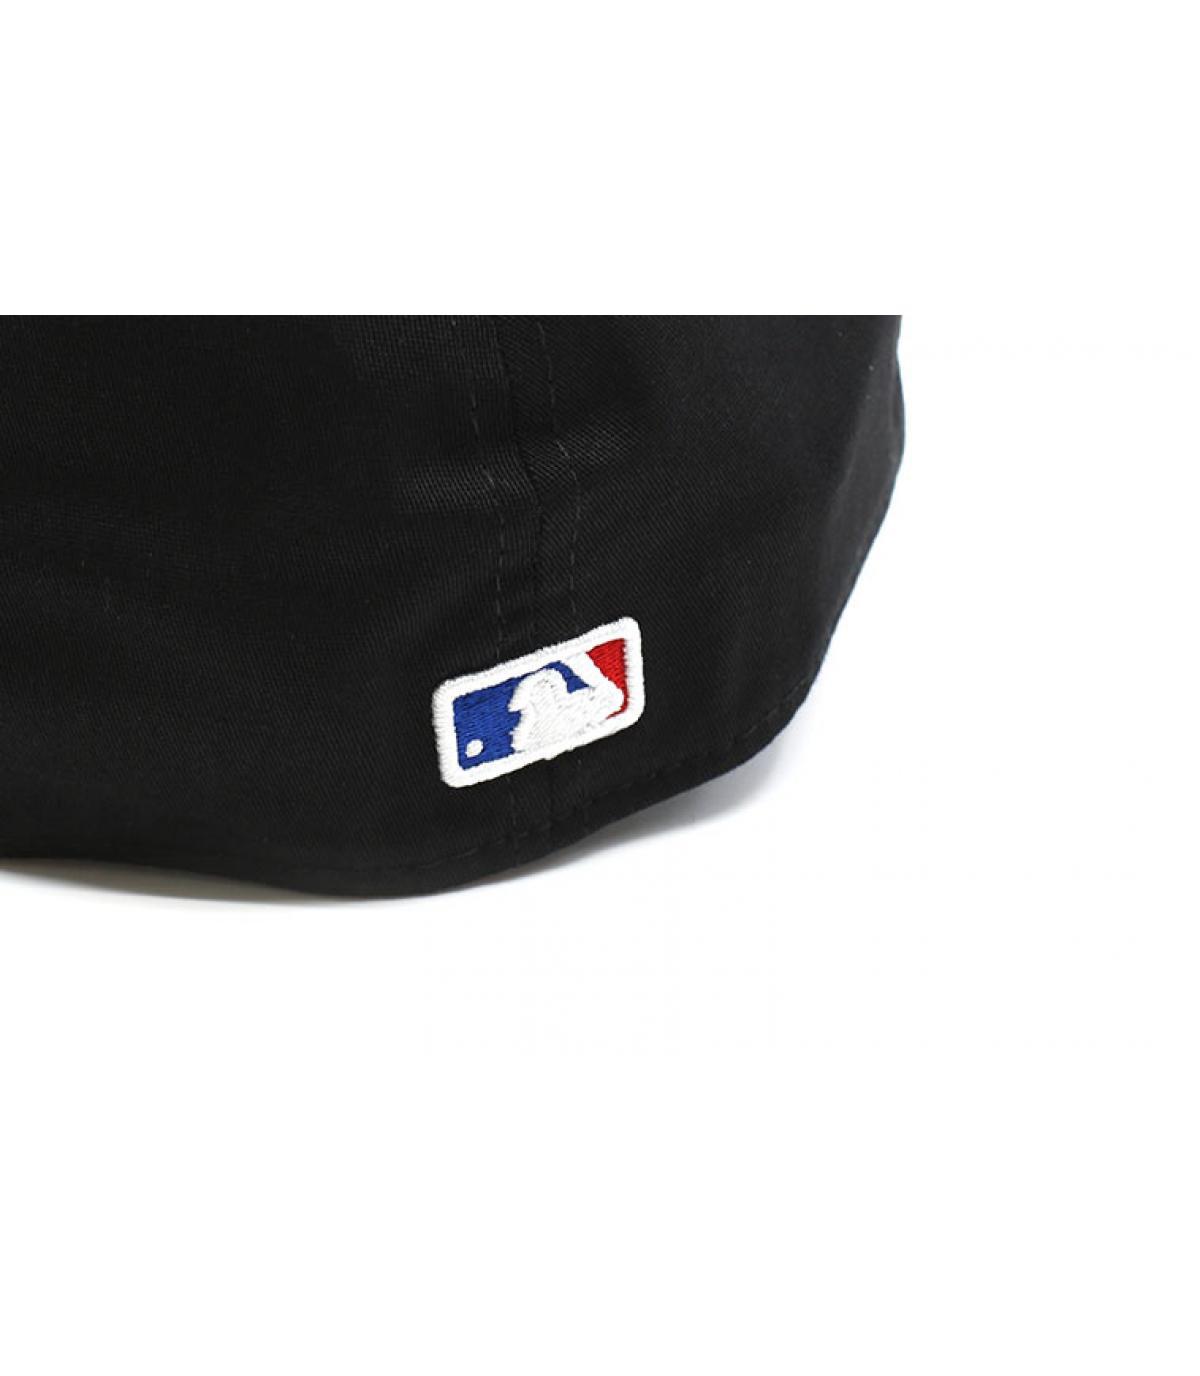 Details Cap League Ess NY 39Thirty black olive - Abbildung 5